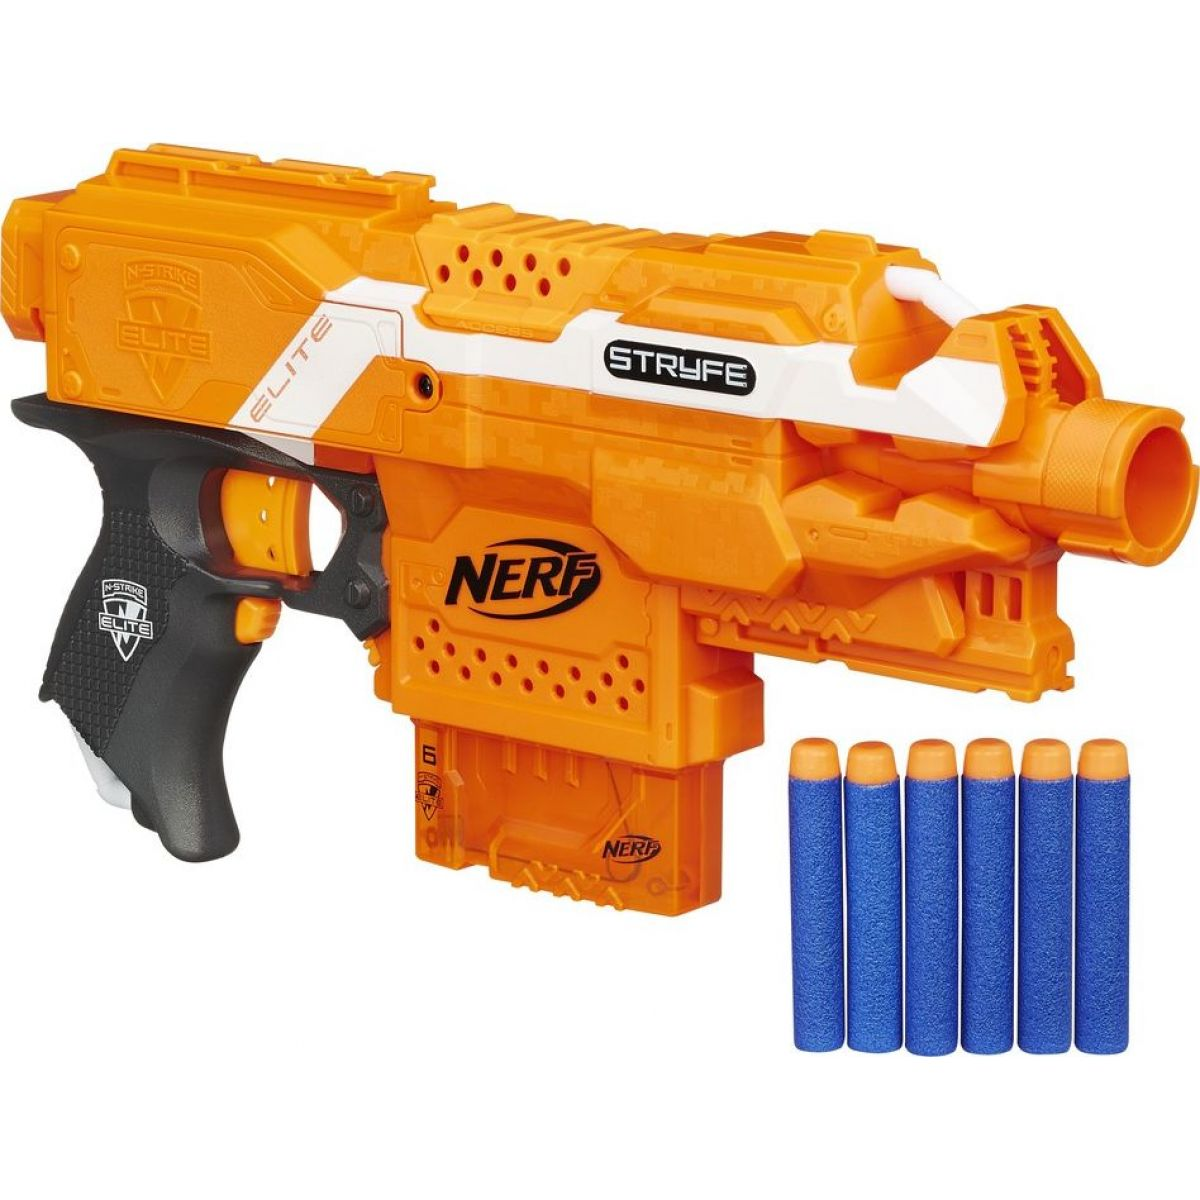 Hasbro Nerf N-Strike Elite Stryfe Blaster